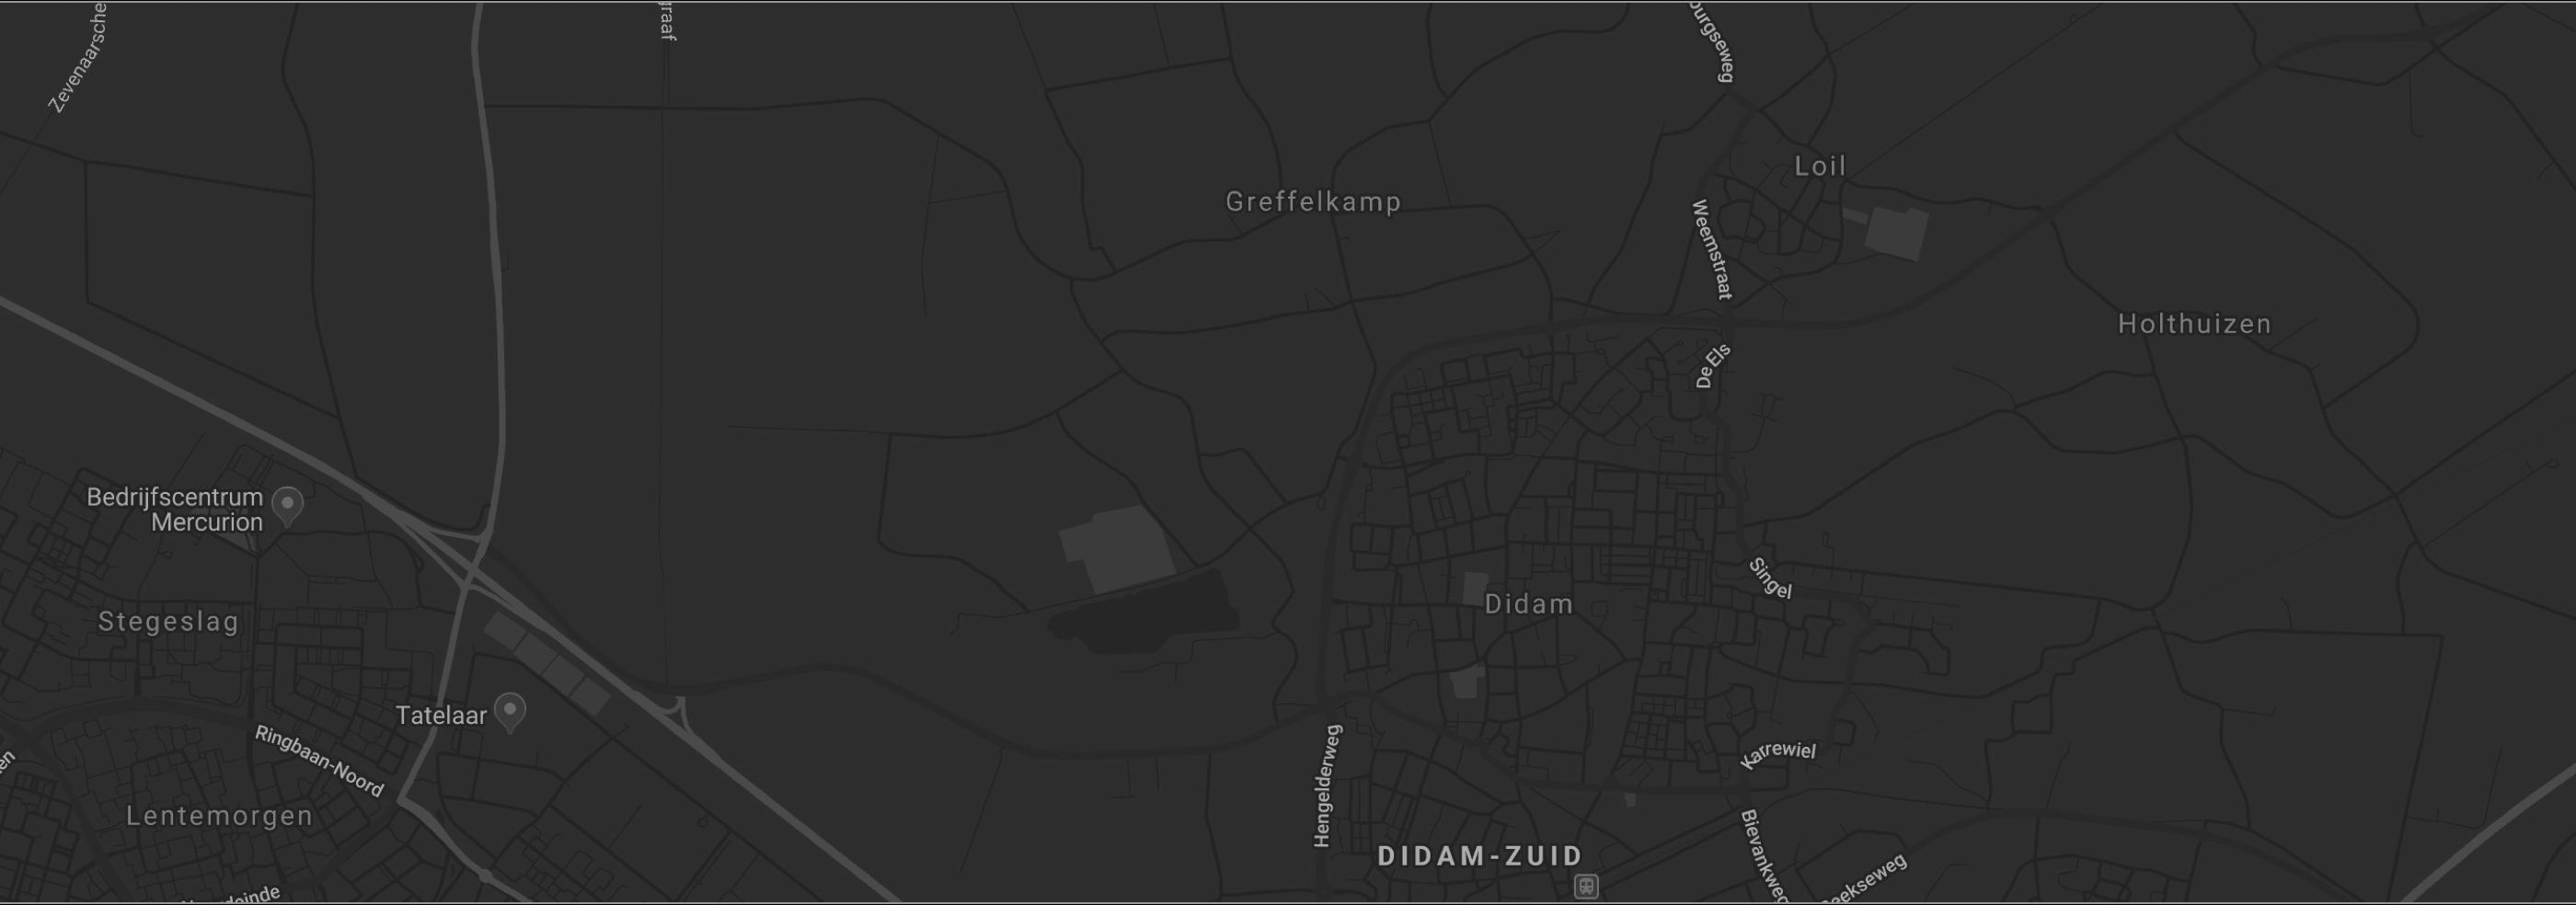 Maps image